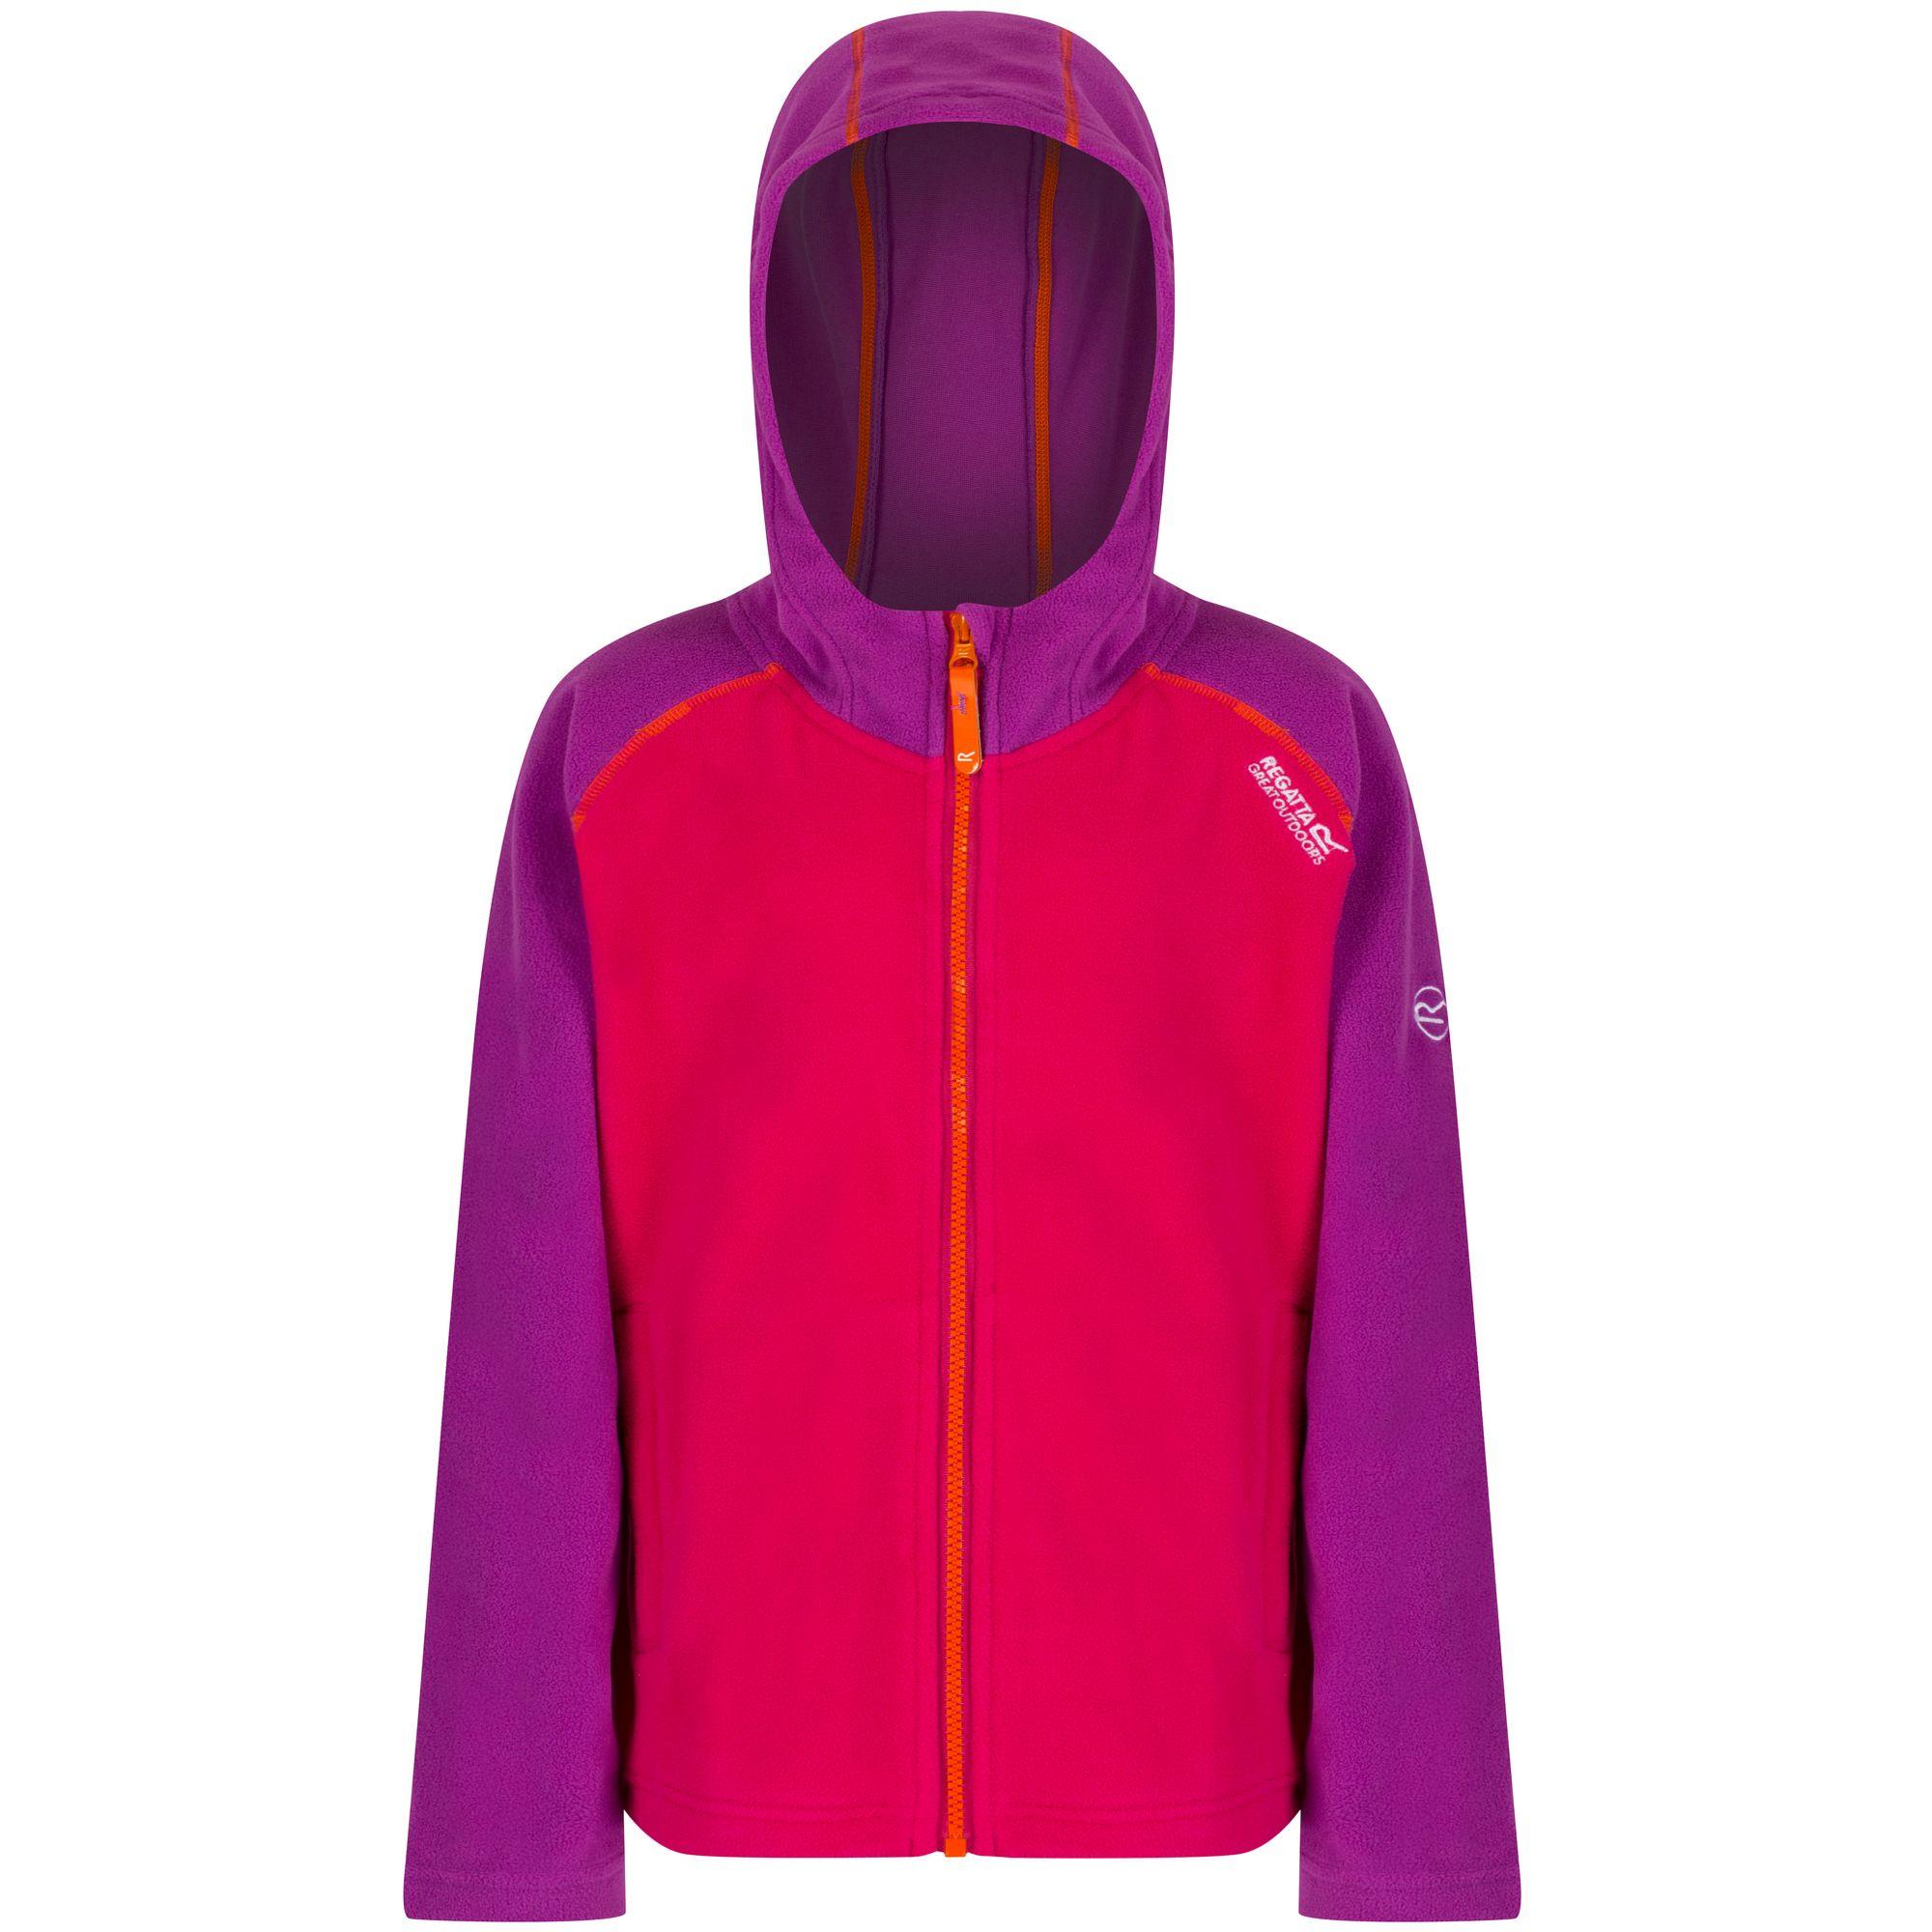 922ebf1f6 Regatta Great Outdoors Childrens boys Upflow Hooded Fleece Jacket 9 ...